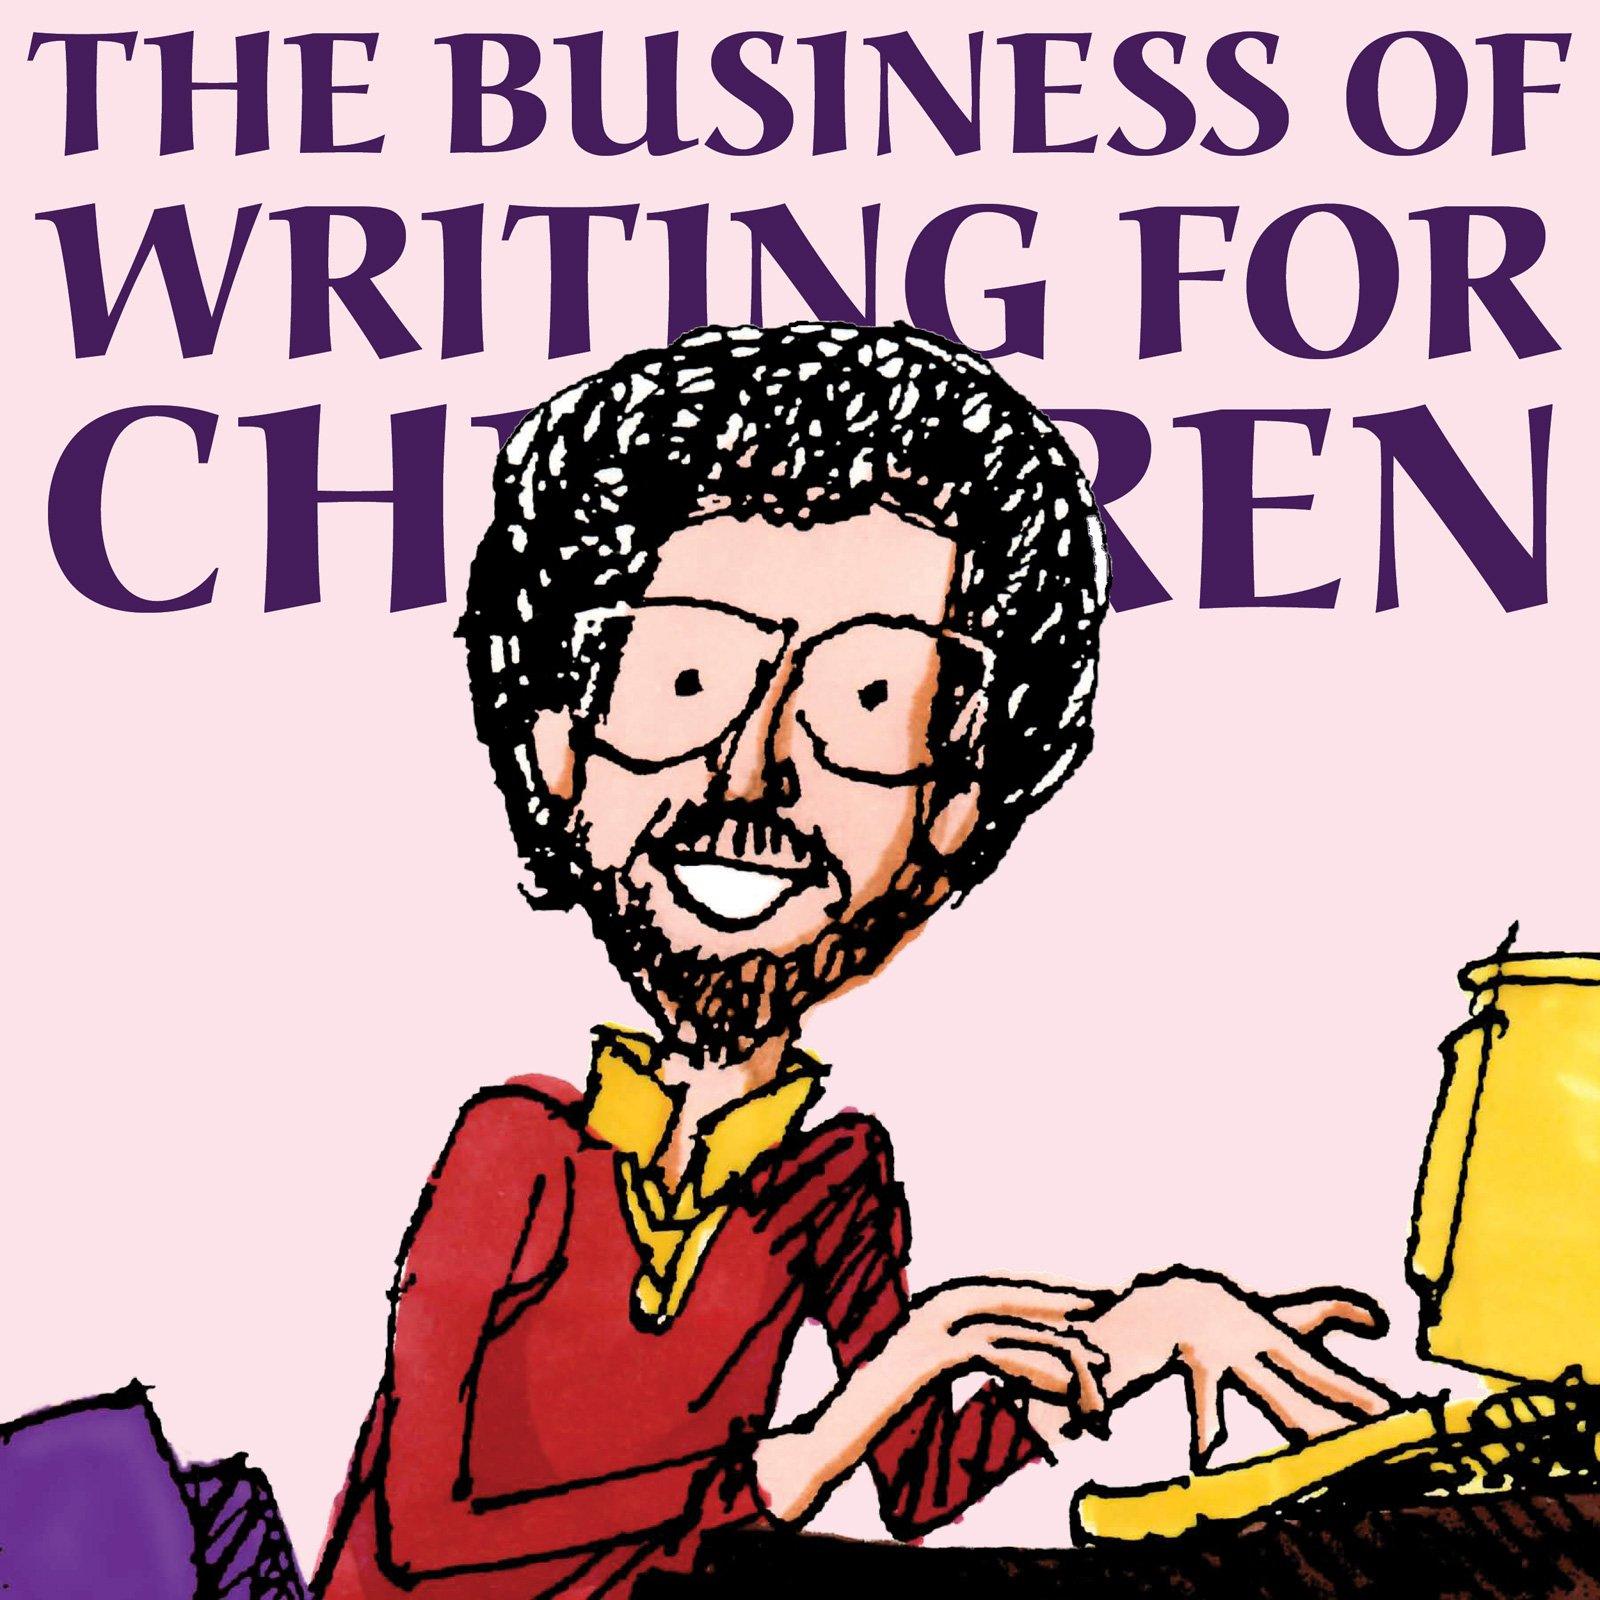 Business Writing Children Award Winning Publishing product image